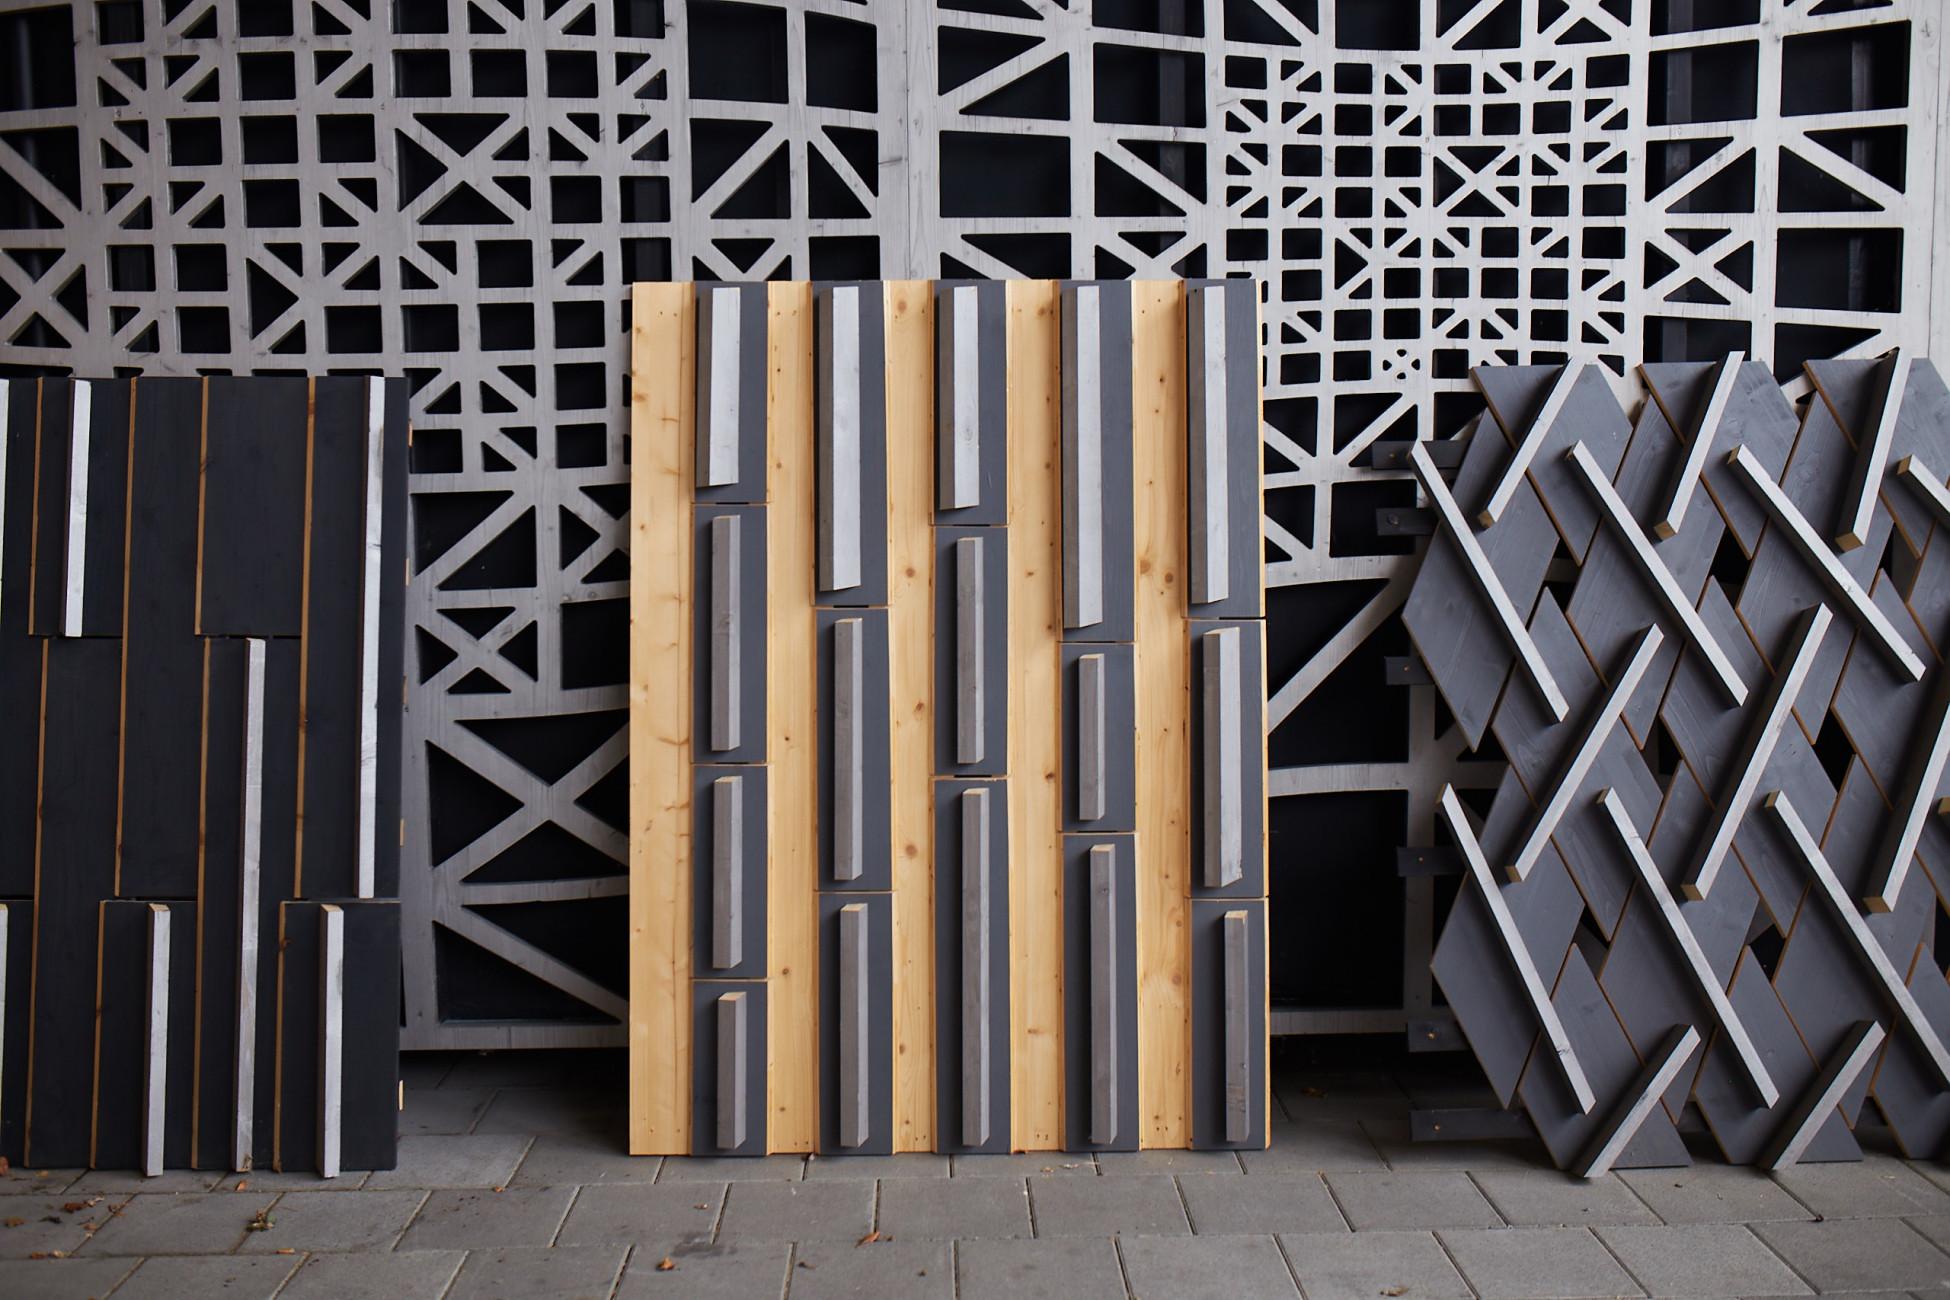 Diverse Mock-up parametrischer Fassaden aneinander gereiht